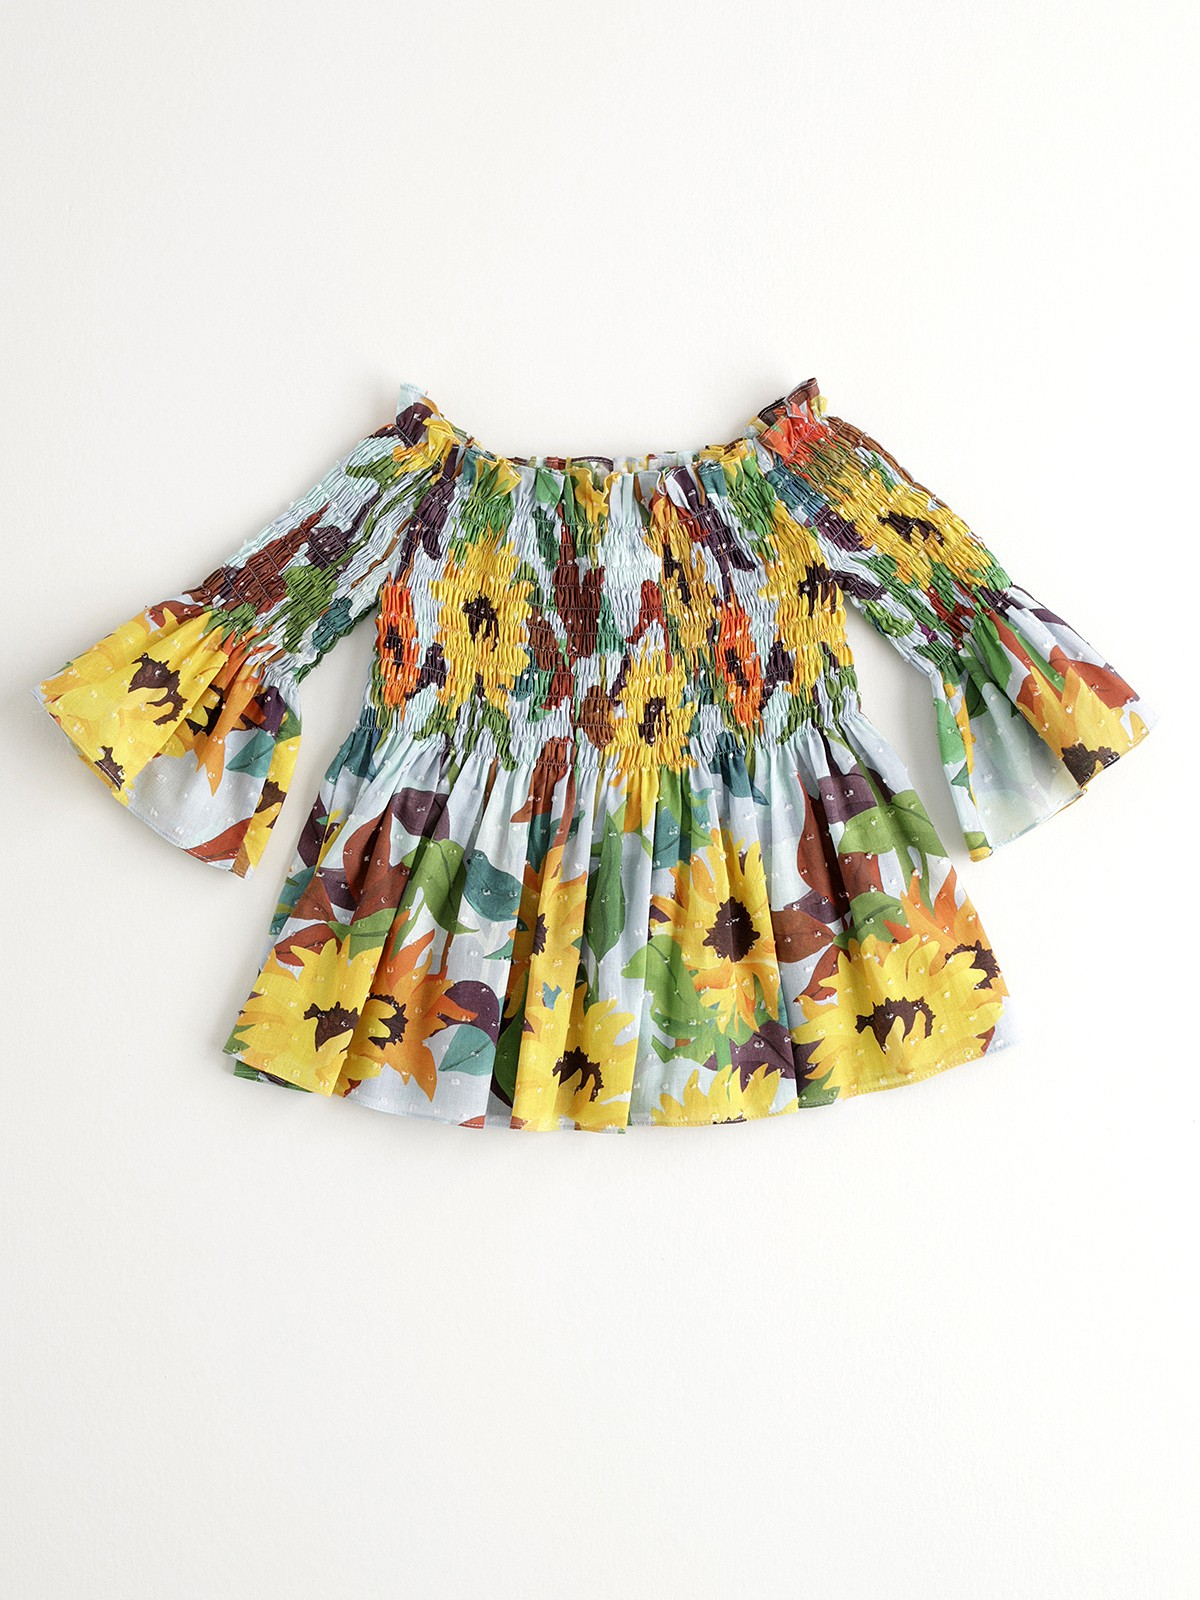 NANOS 向日葵水袖上衣